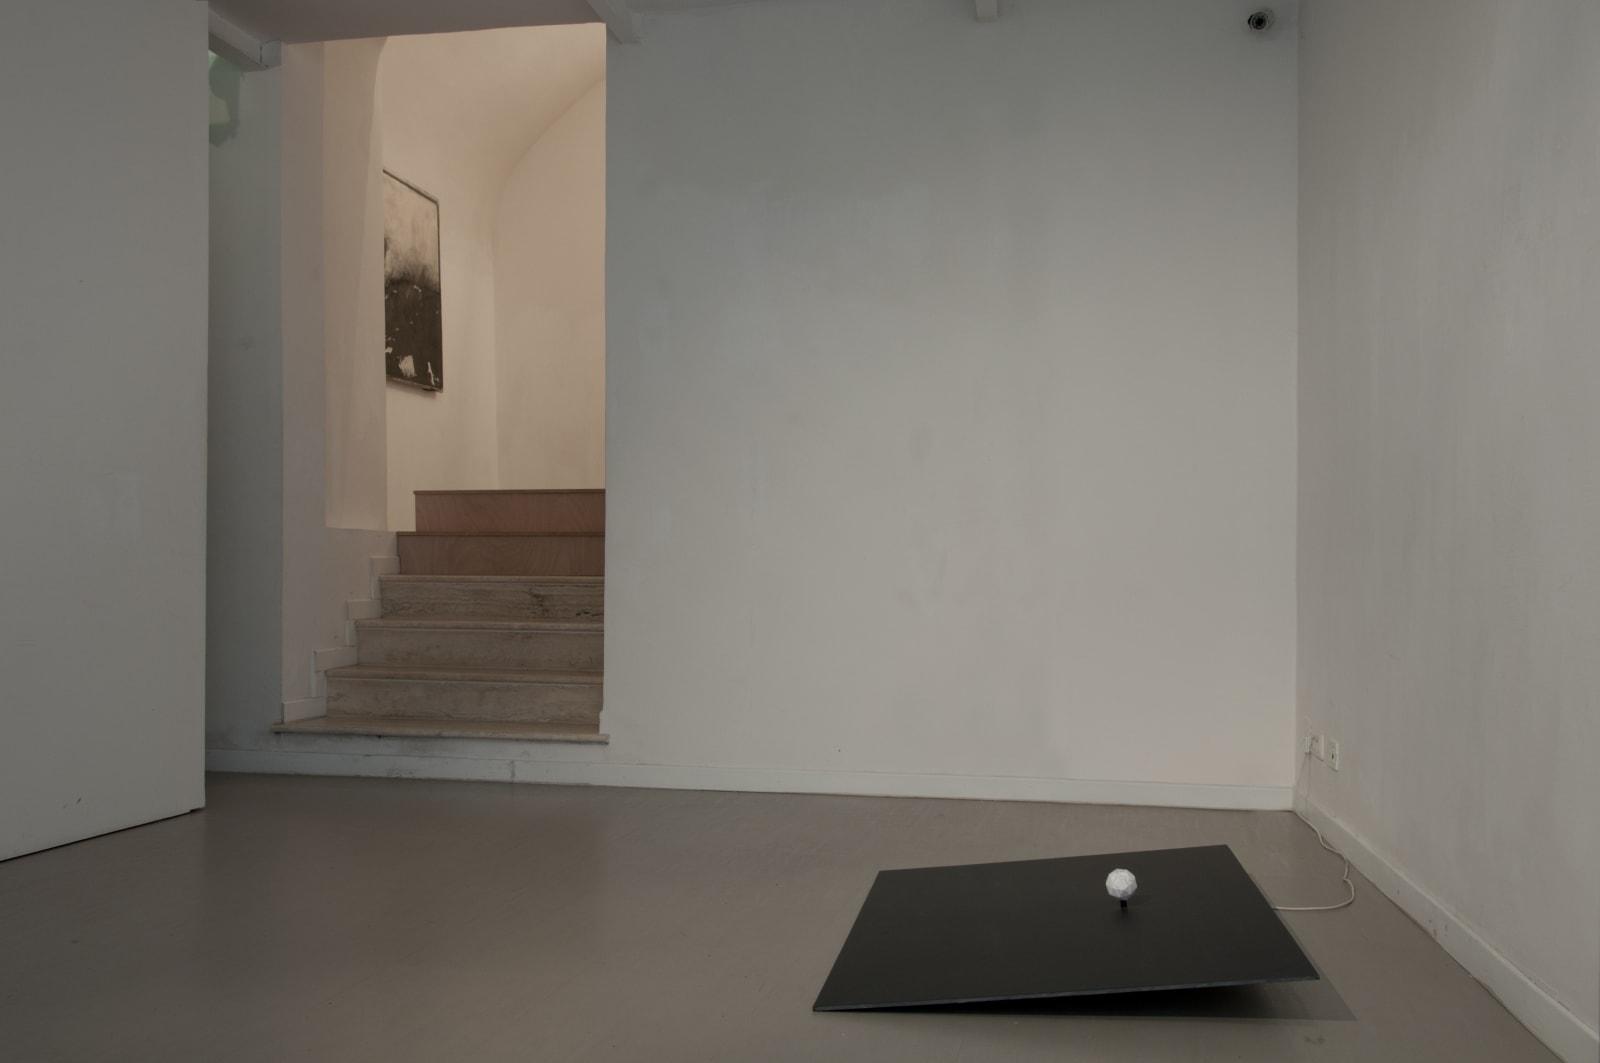 Marco Maria Giuseppe Scifo, Habitat, installation view at z2o Sara Zanin Gallery Roma